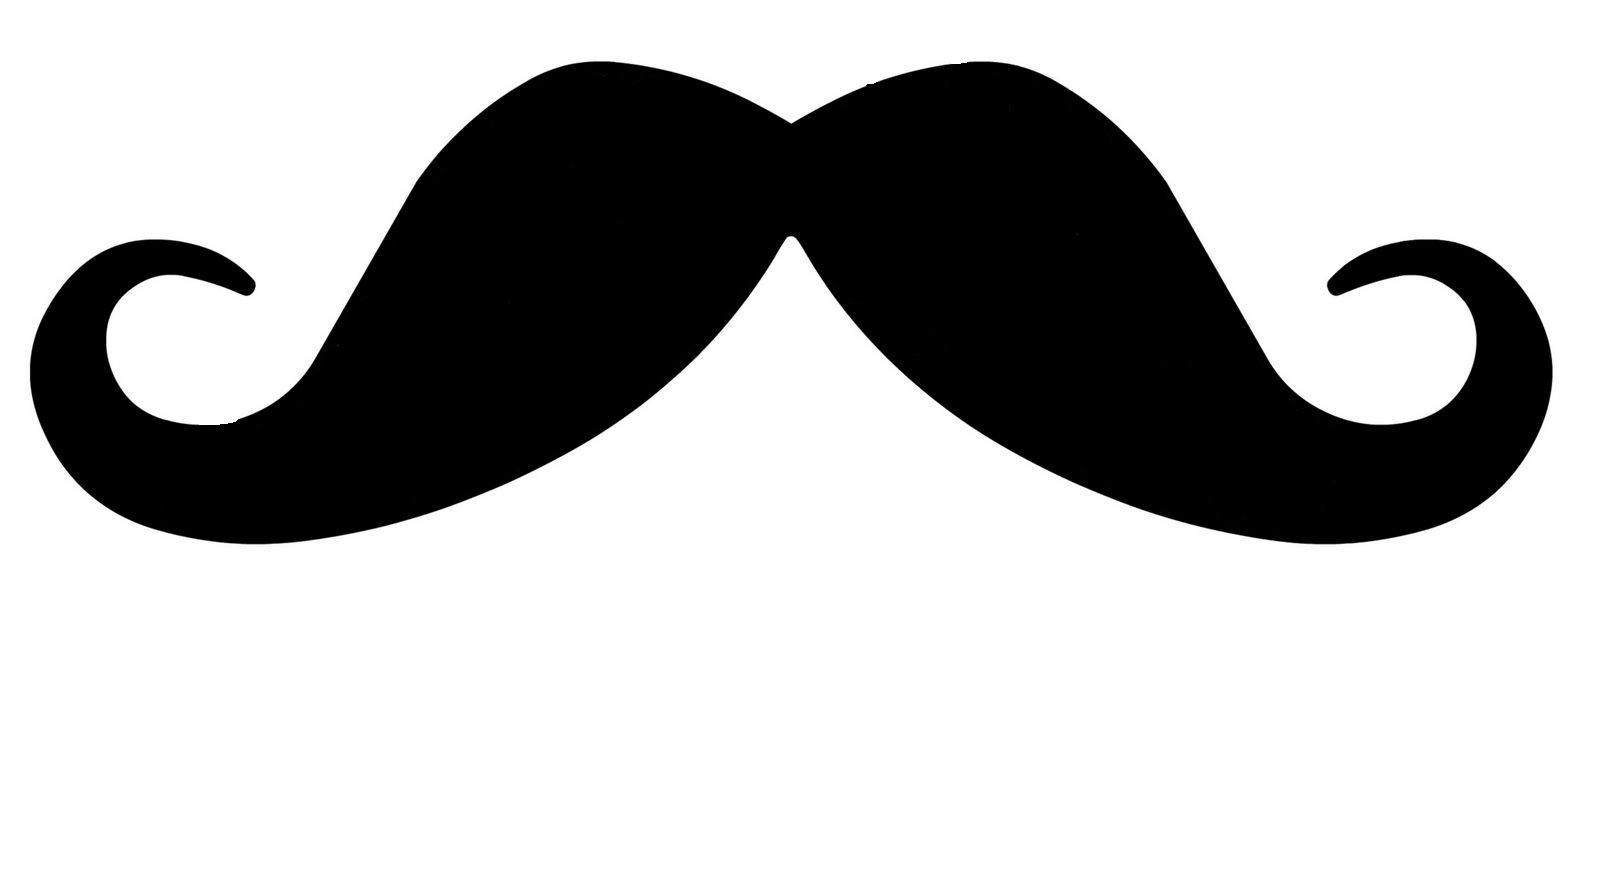 Handlebar Mustache Clip Art Moustache Outline Clipart